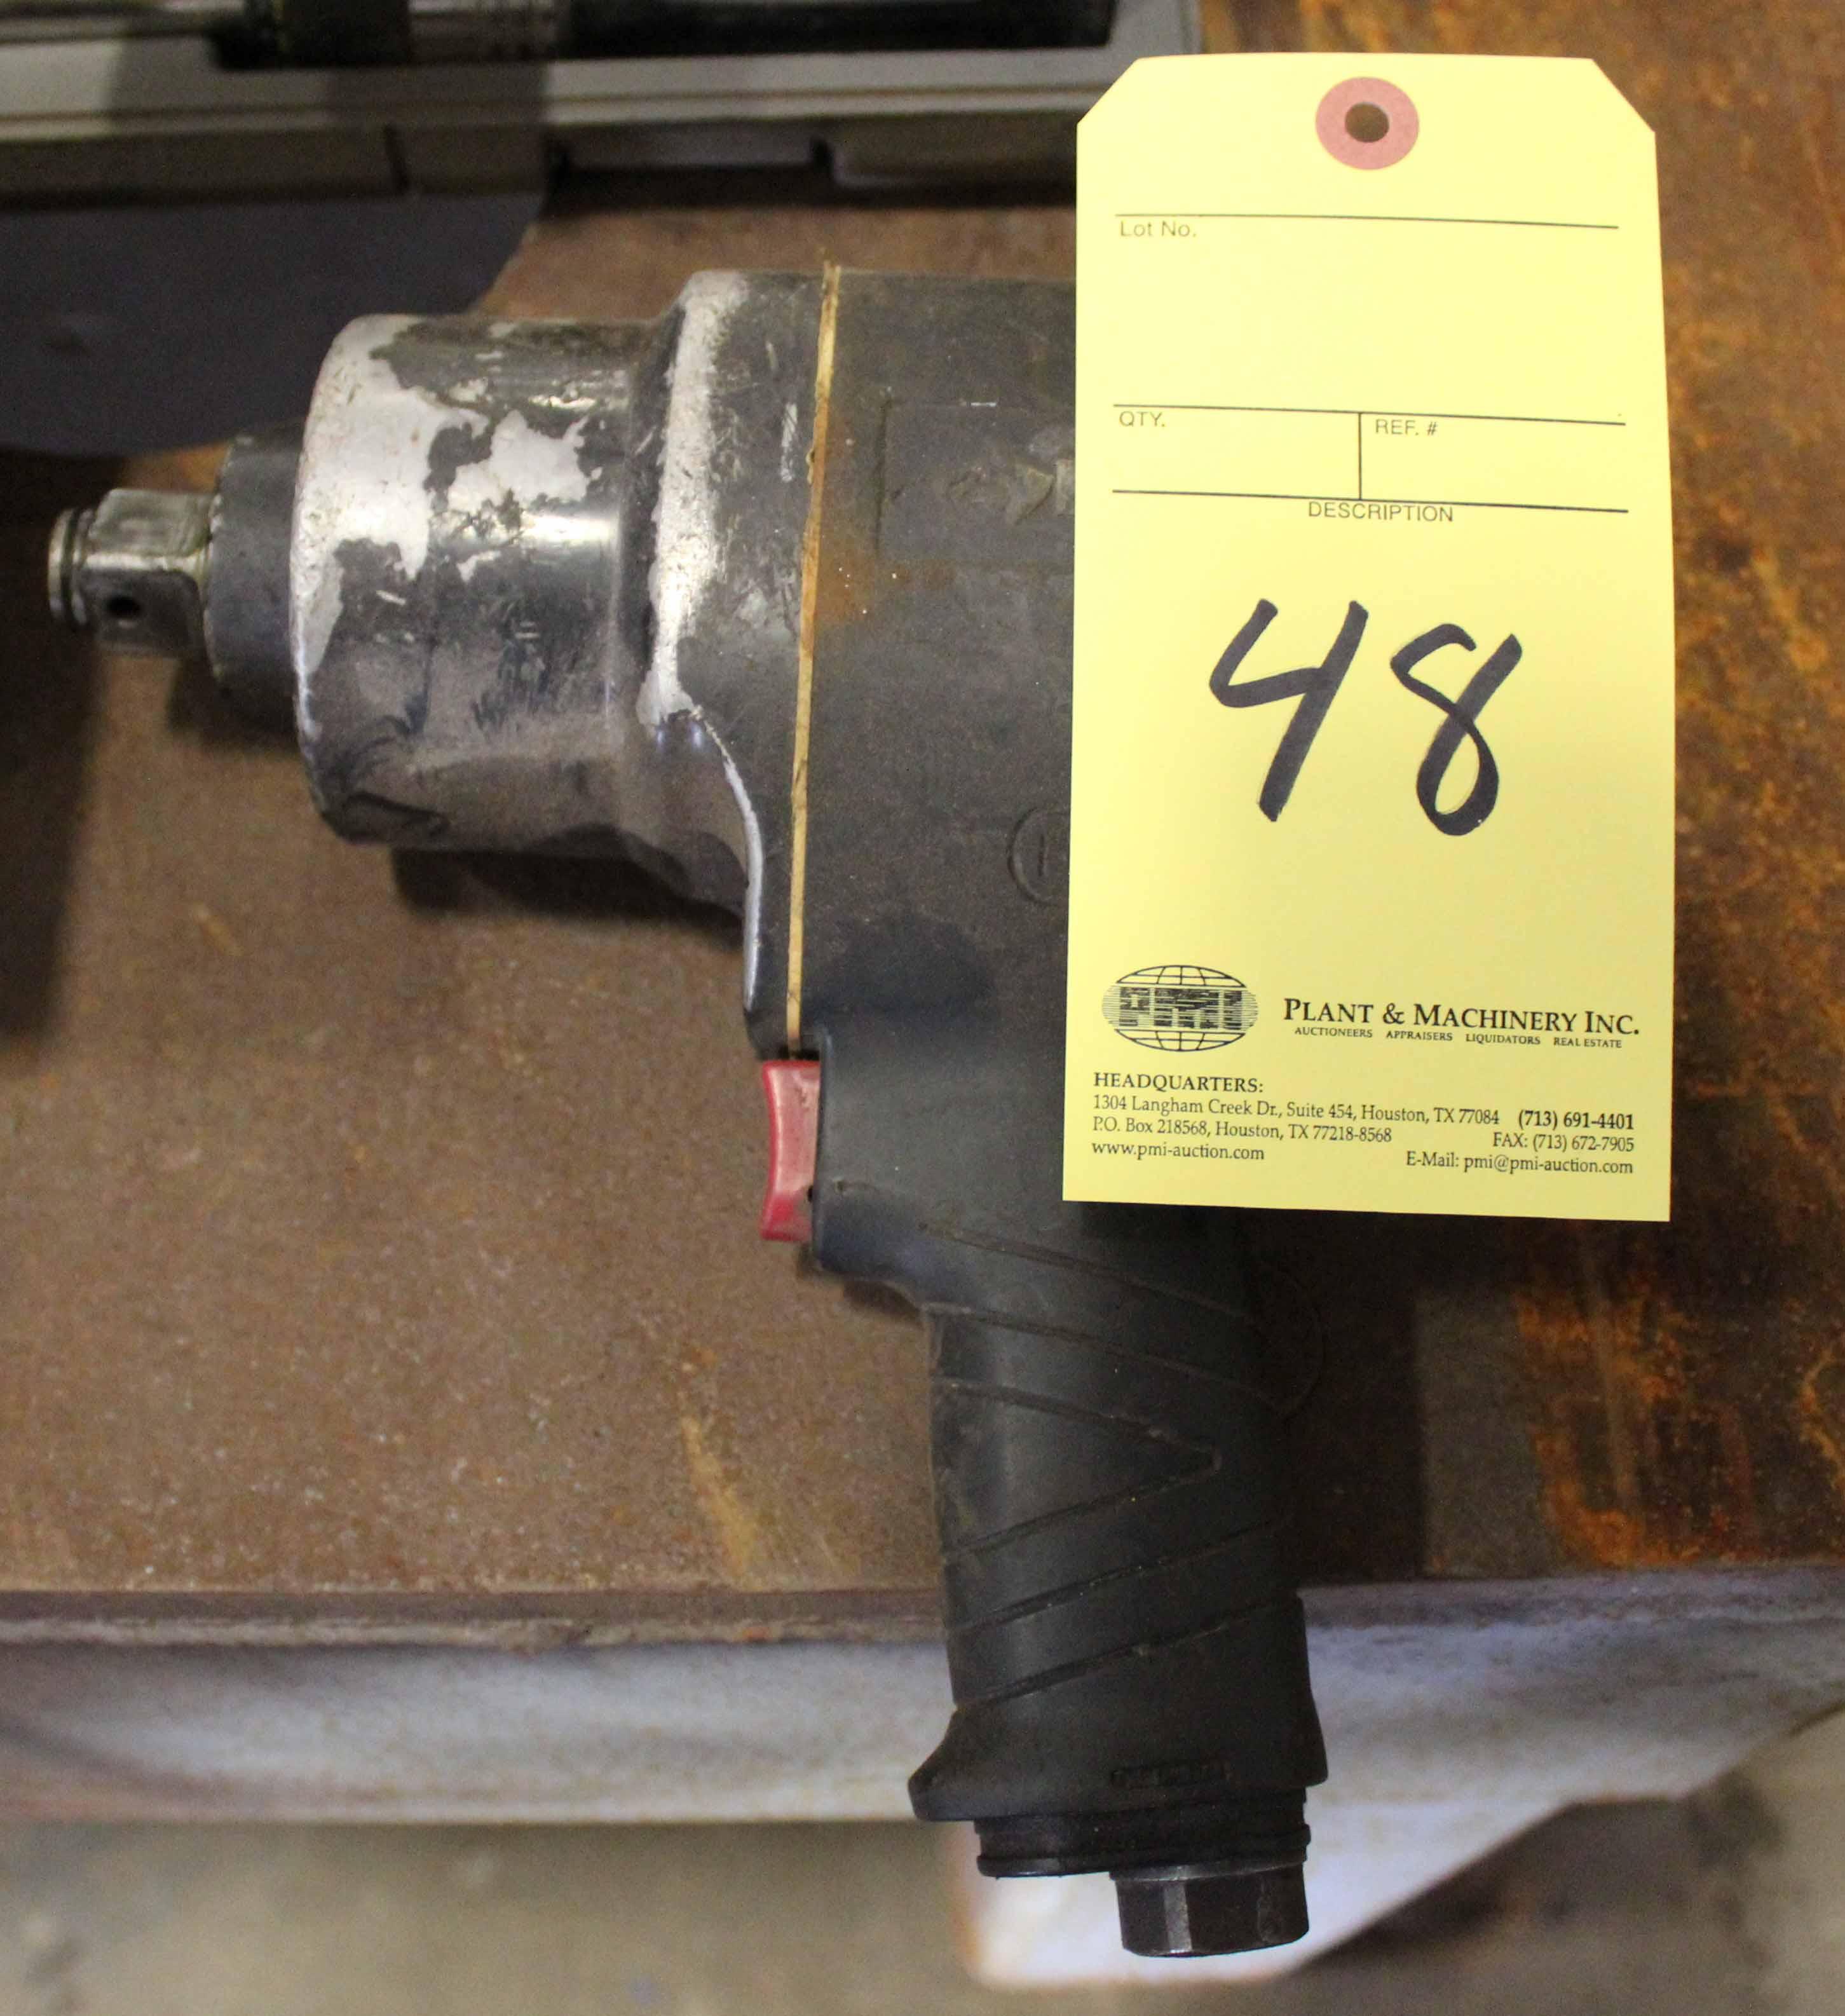 "Lot 48 - IMPACT WRENCH, HUSKY, 3/4"" drive"